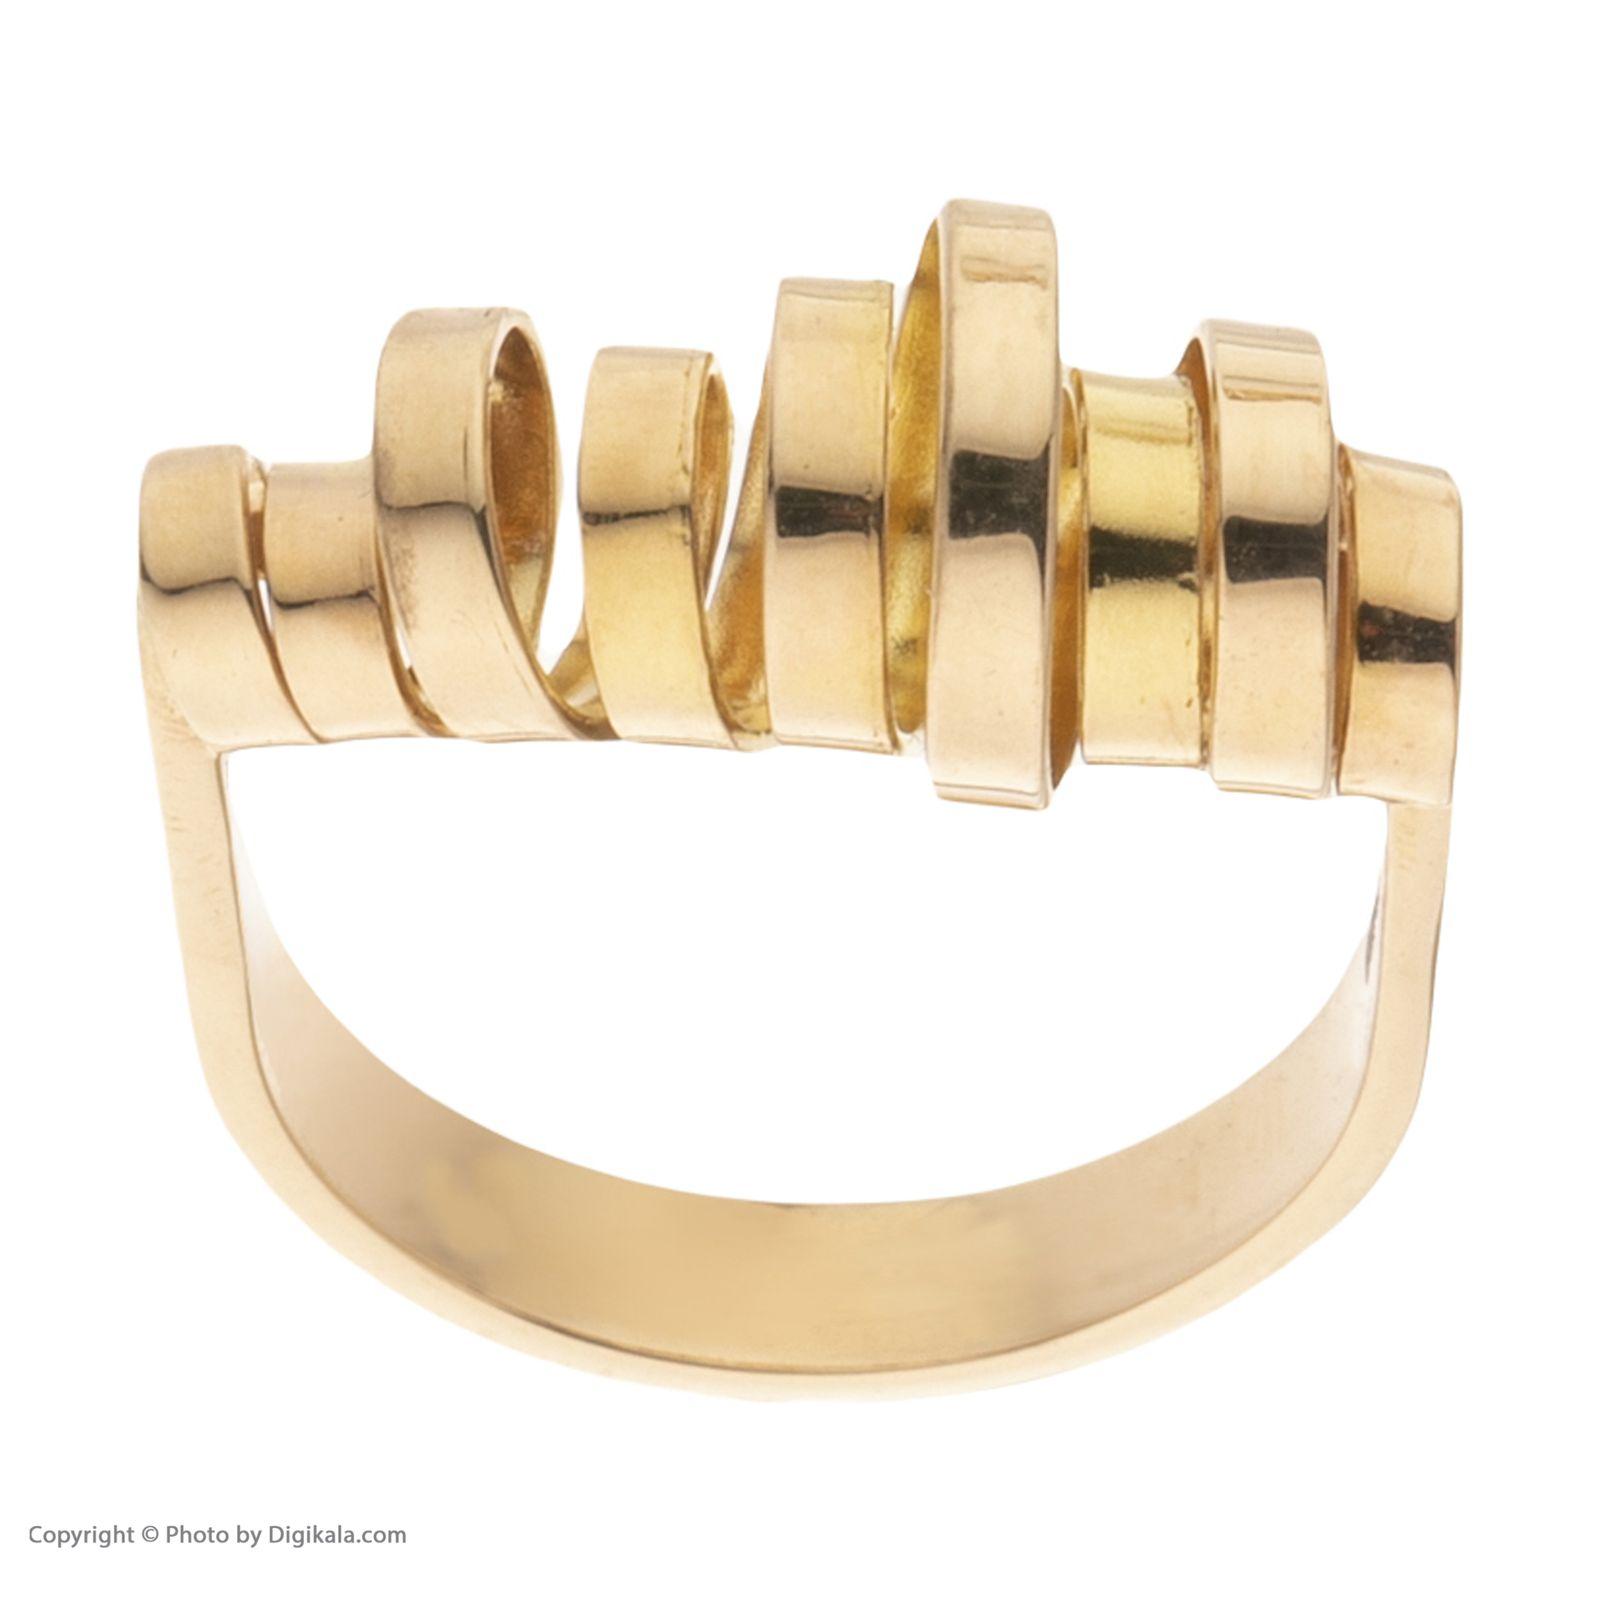 انگشتر طلا 18 عیار زنانه سنجاق مدل X068337 -  - 3